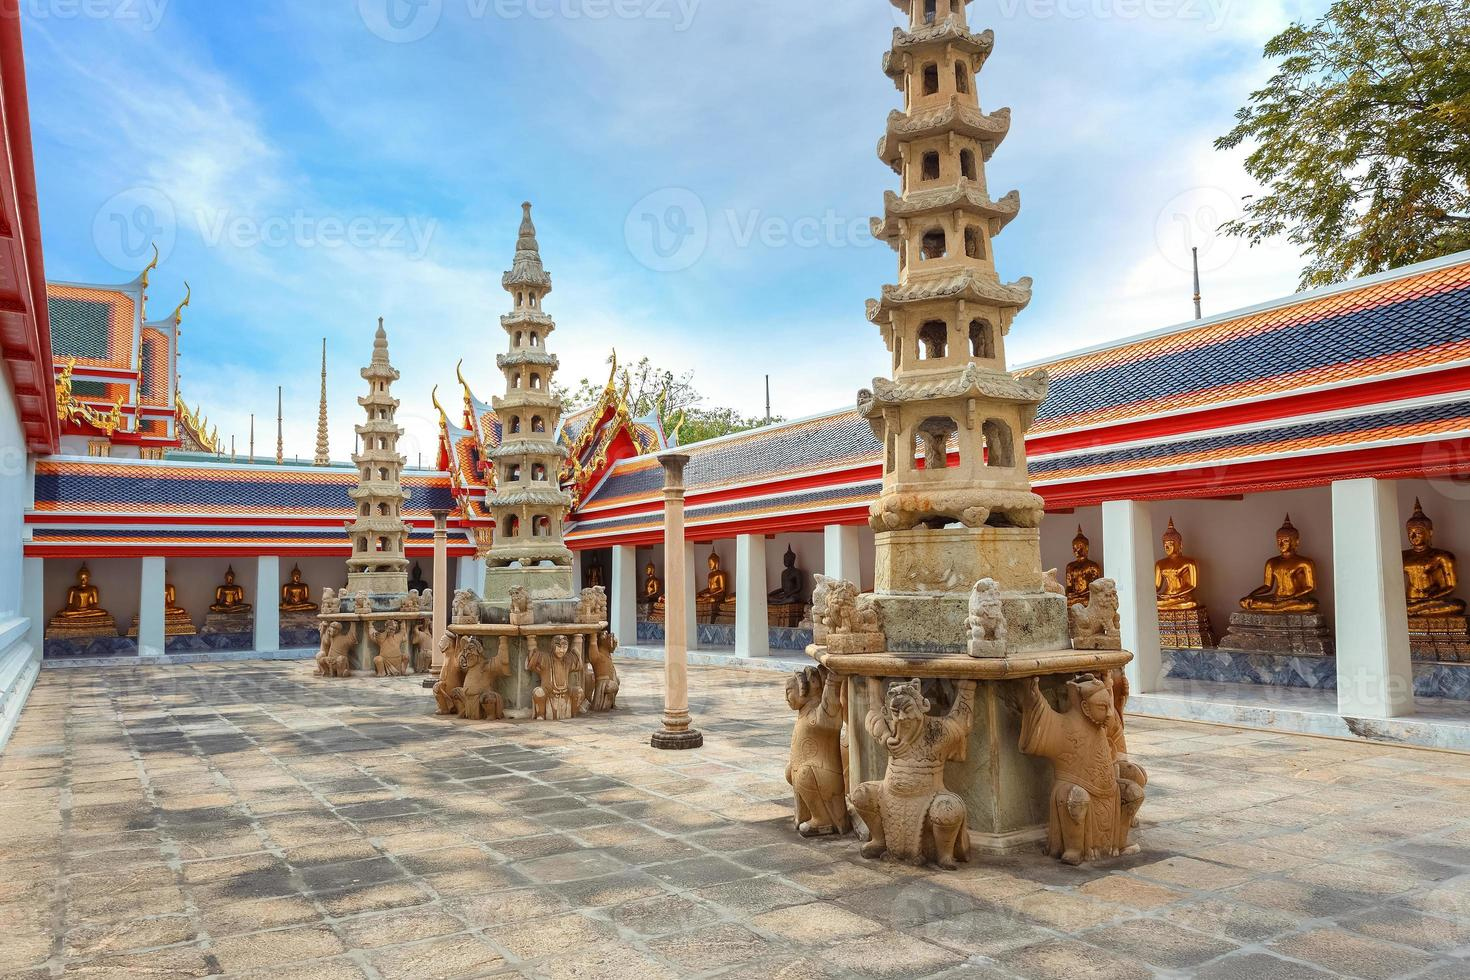 Wat Pho (Pho Temple) in Bangkok, Thailand photo